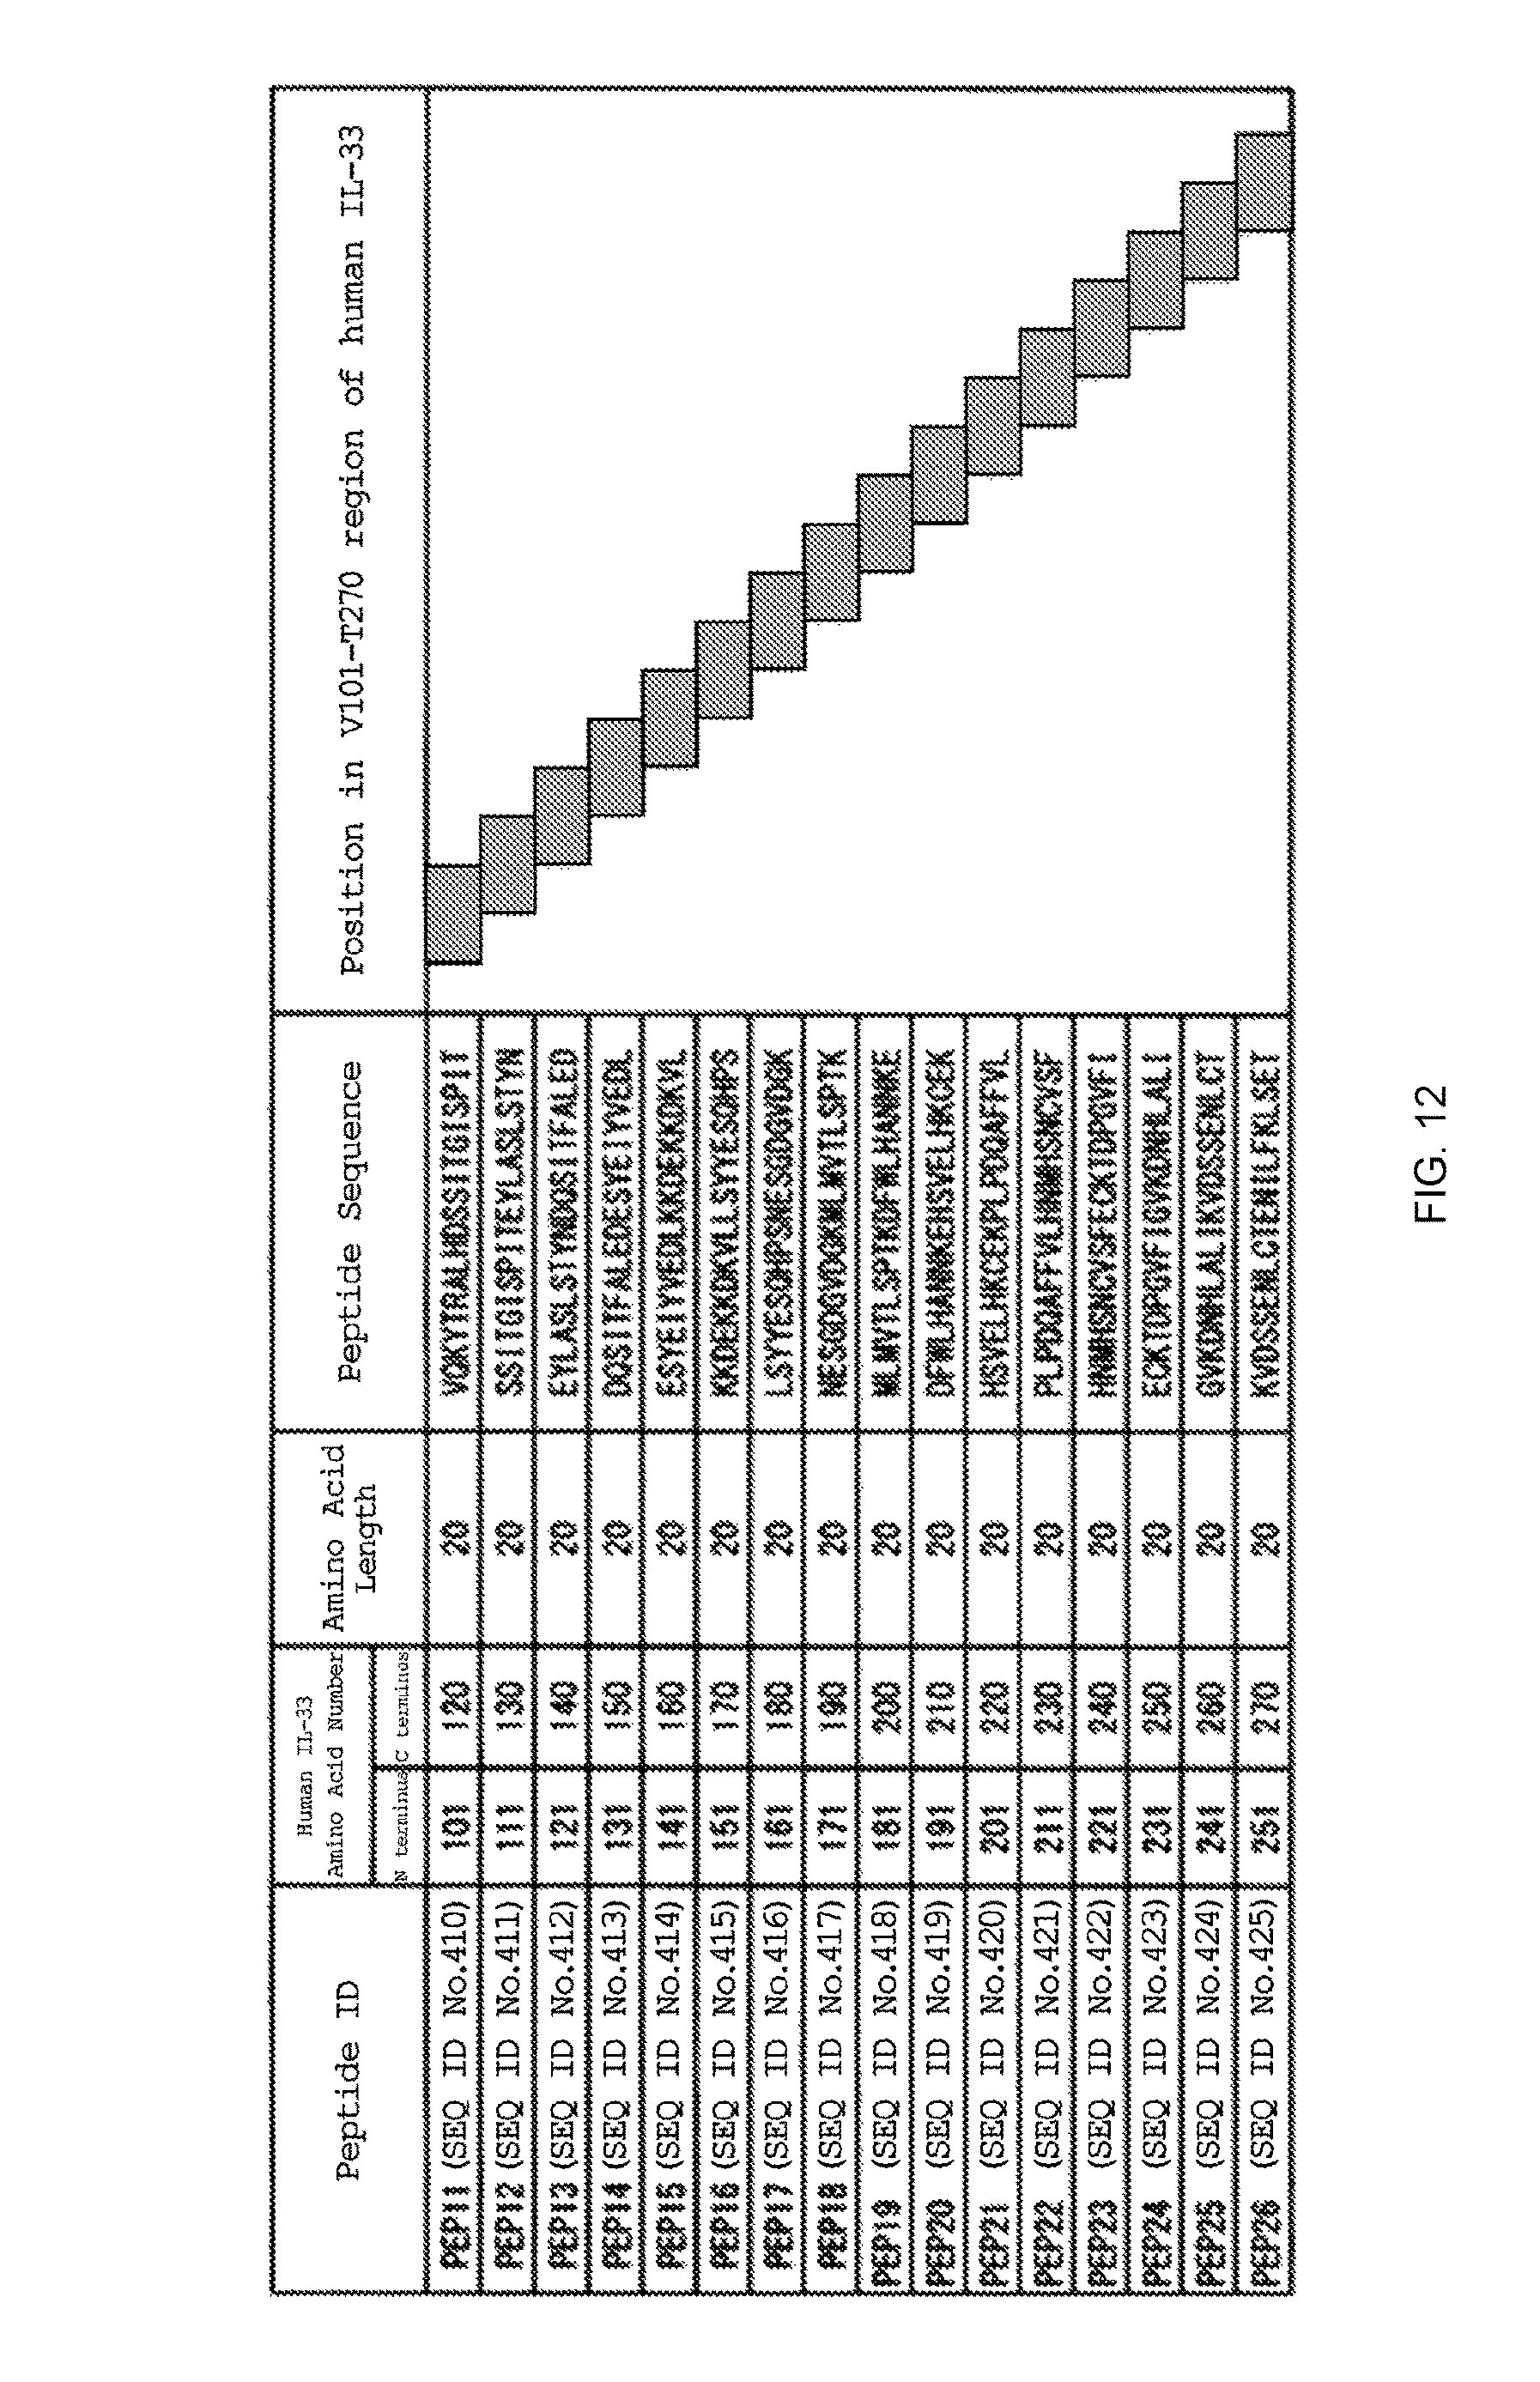 patentimages storage googleapis com/5e/4f/12/3b75b